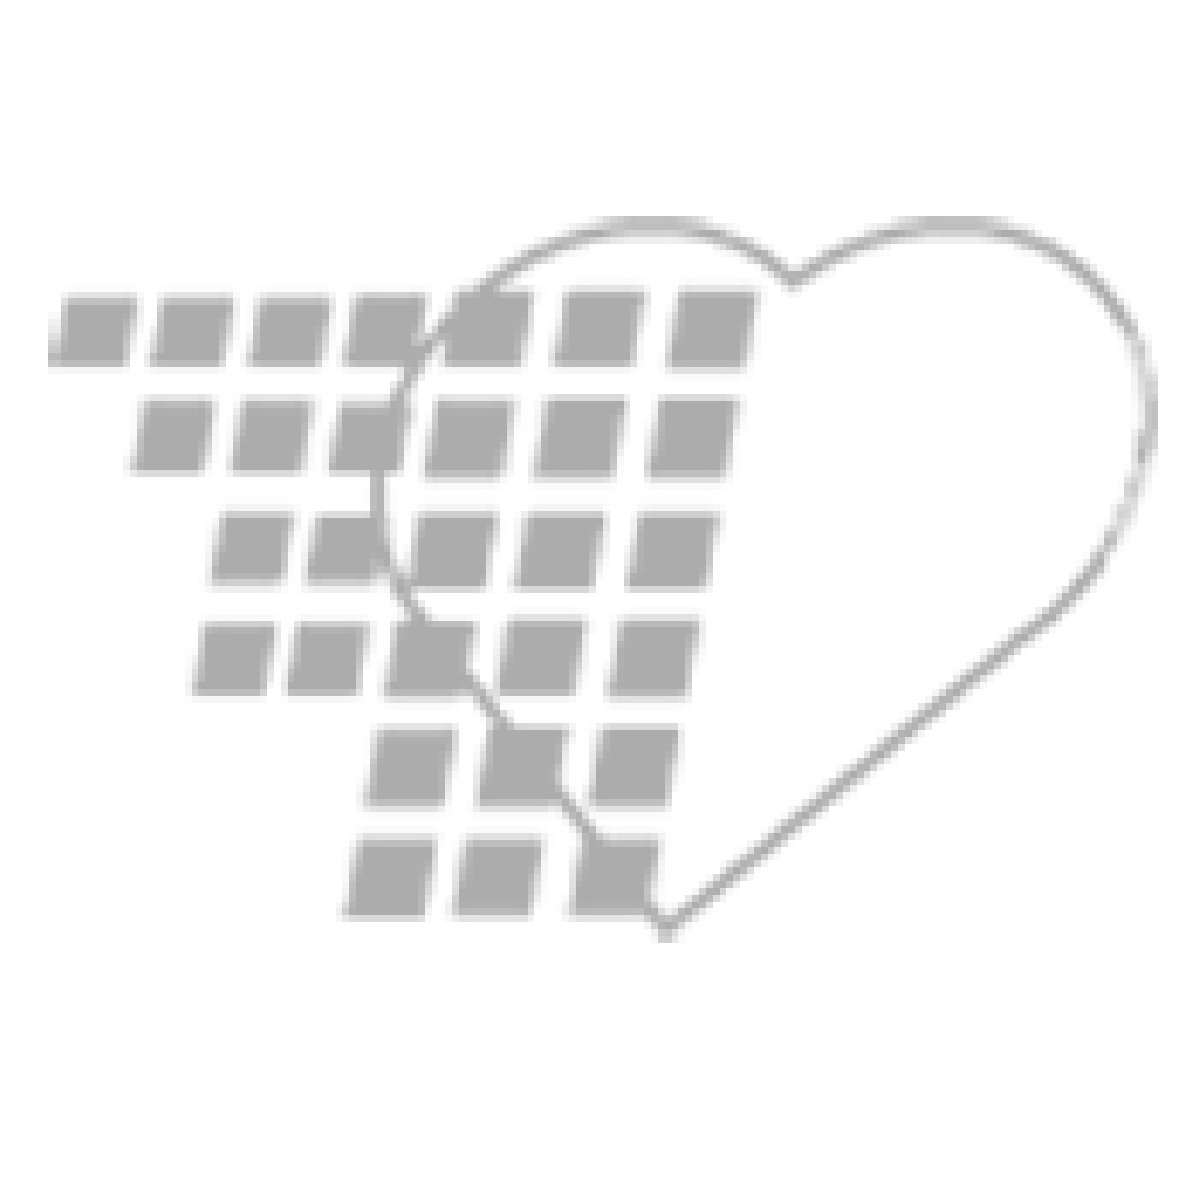 05-87-111 - Stackable Bed Pan